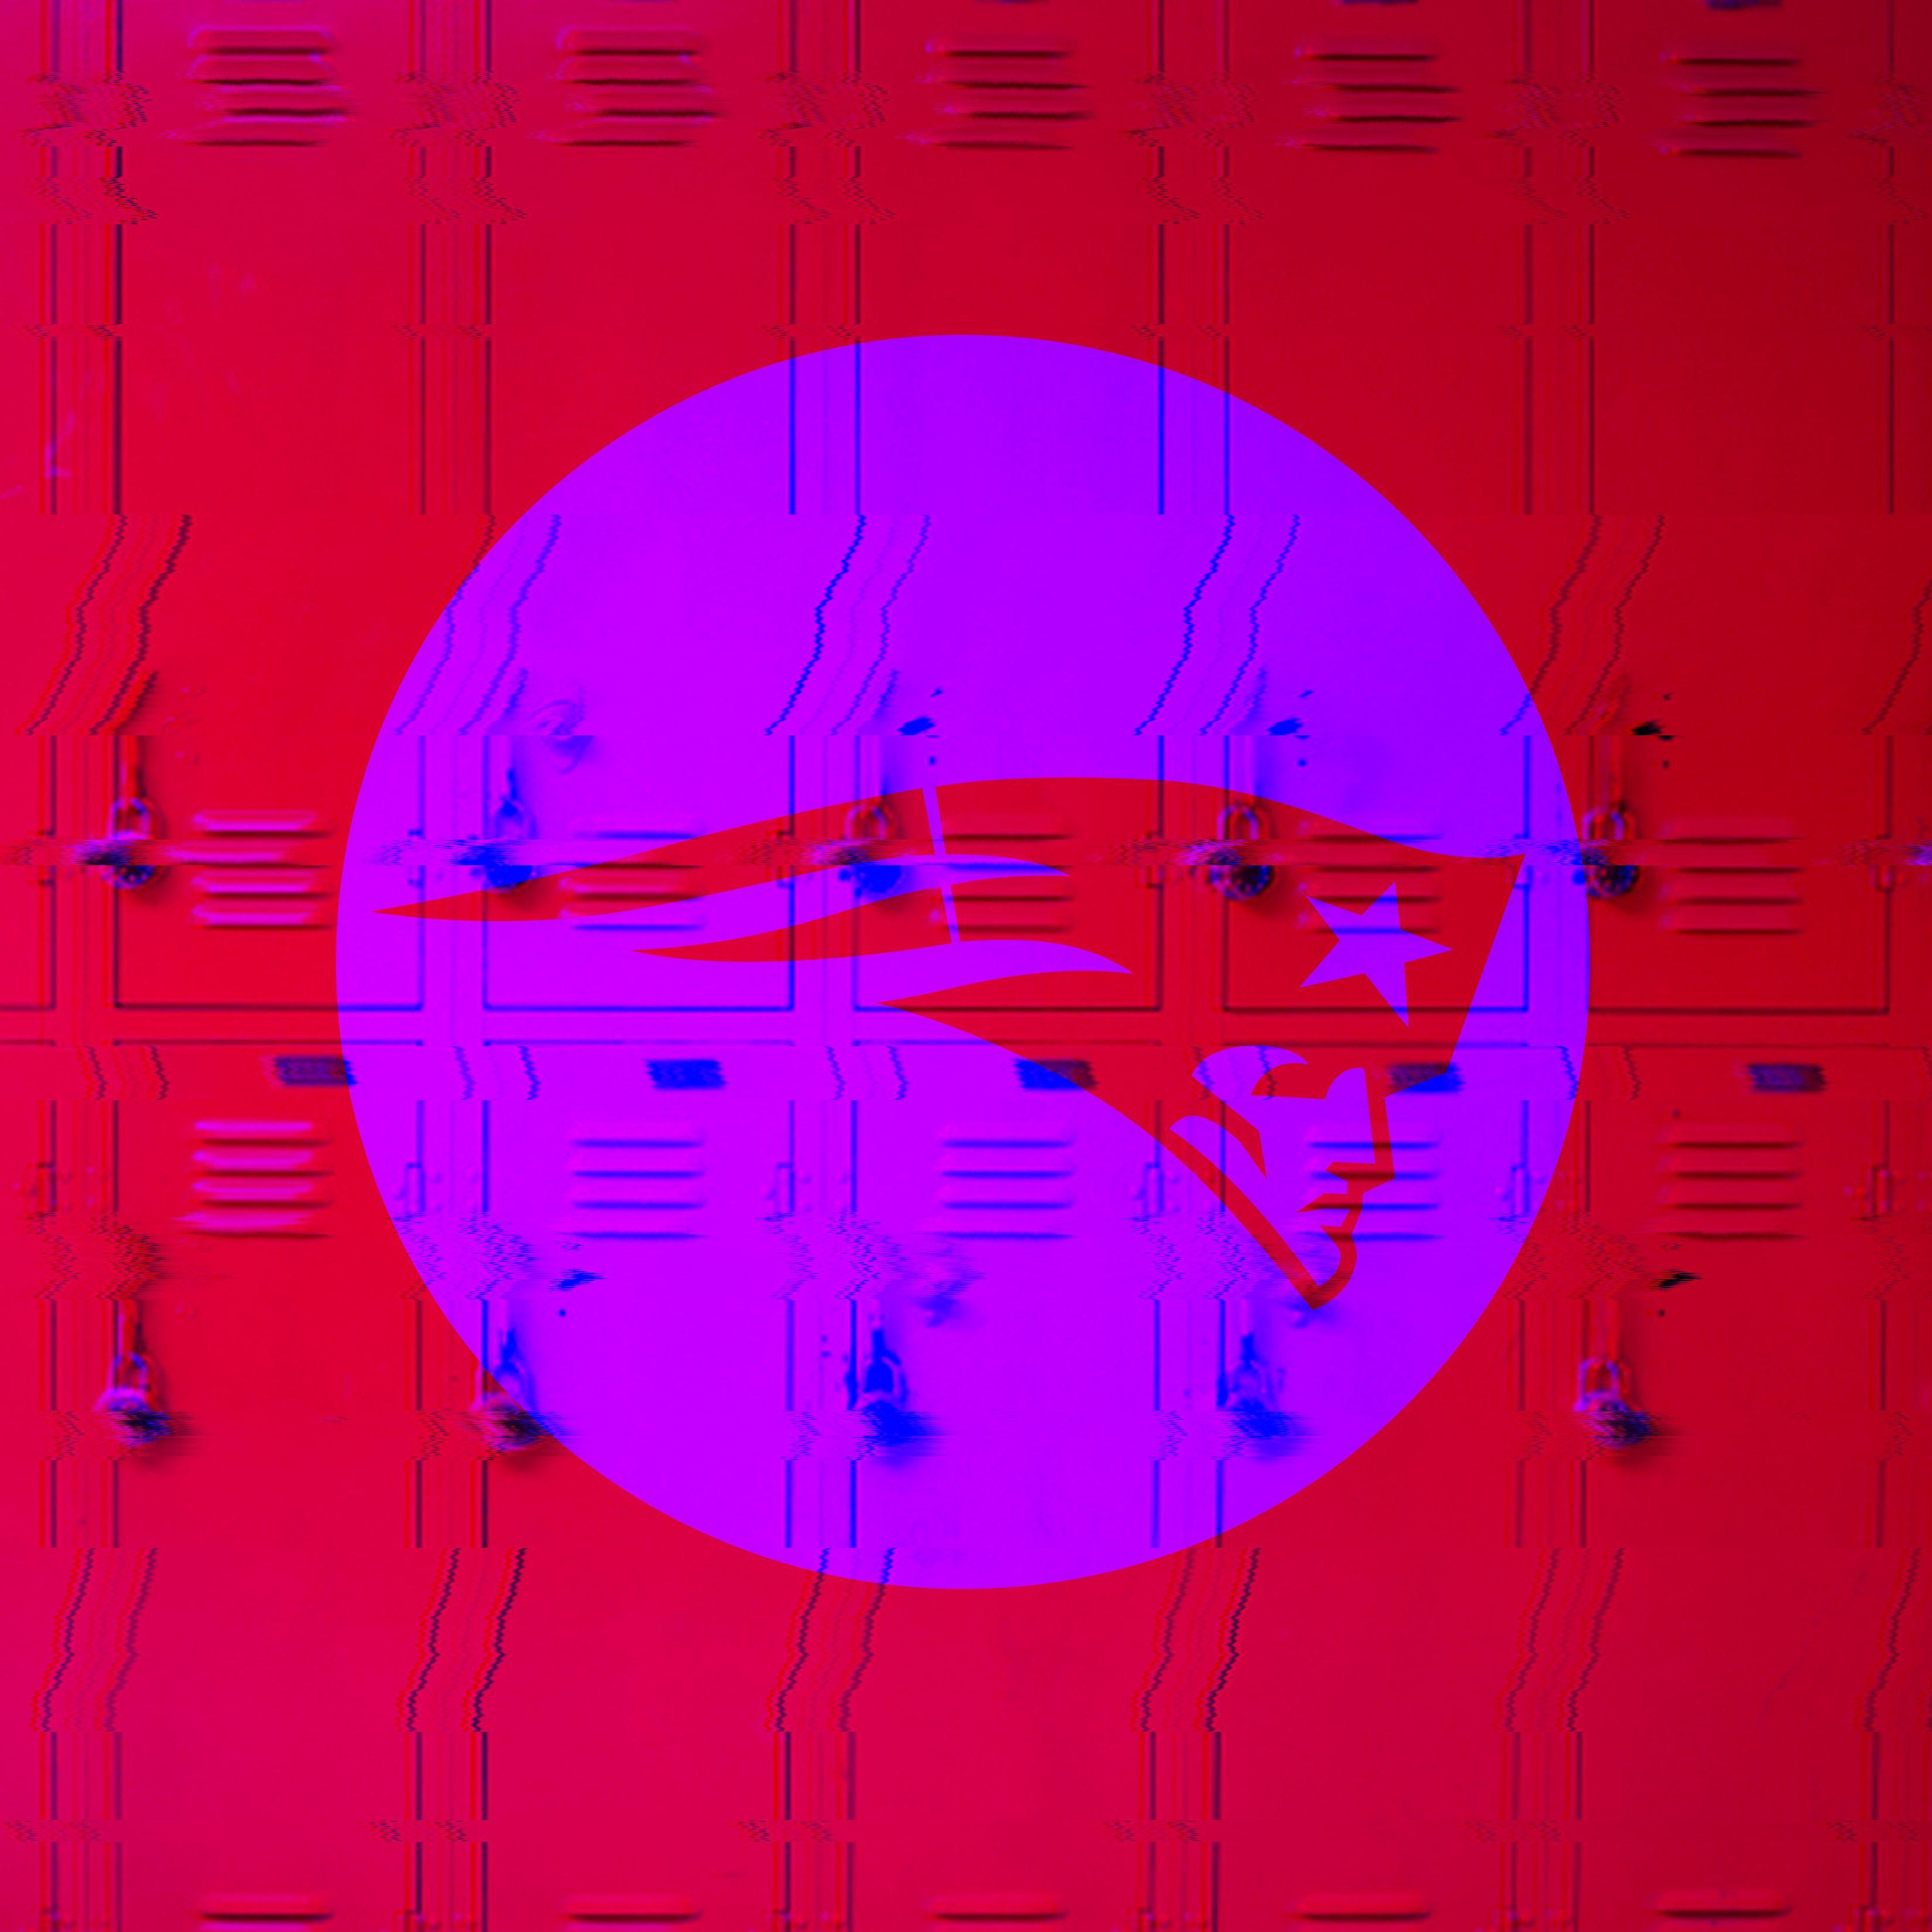 Graduated From Patrick Henry High School School Website School Neon Signs